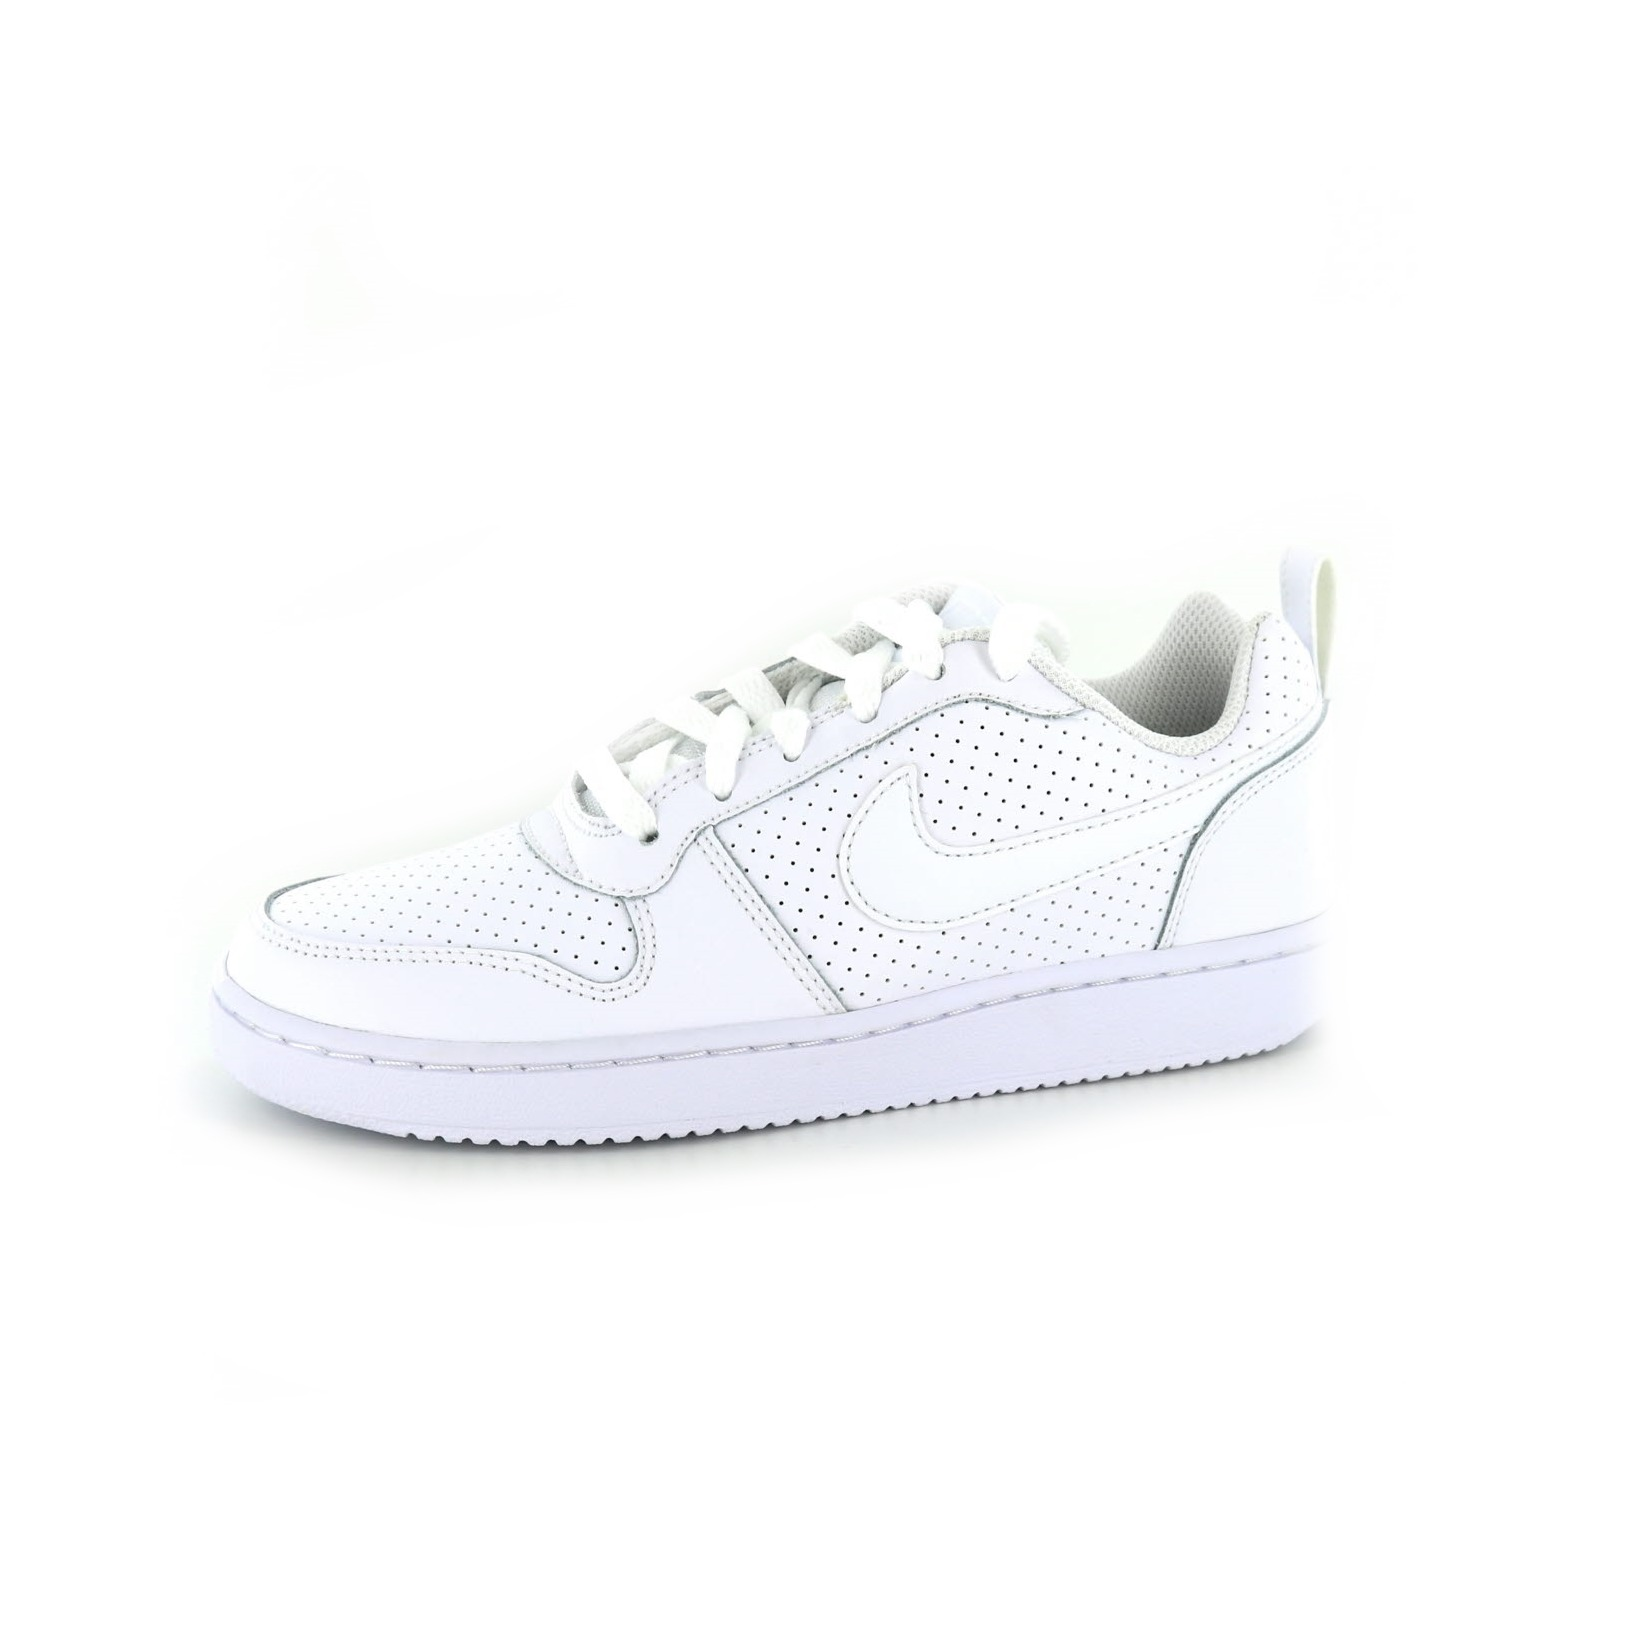 Nike / Blonder Sko - Joggesko, Hvit